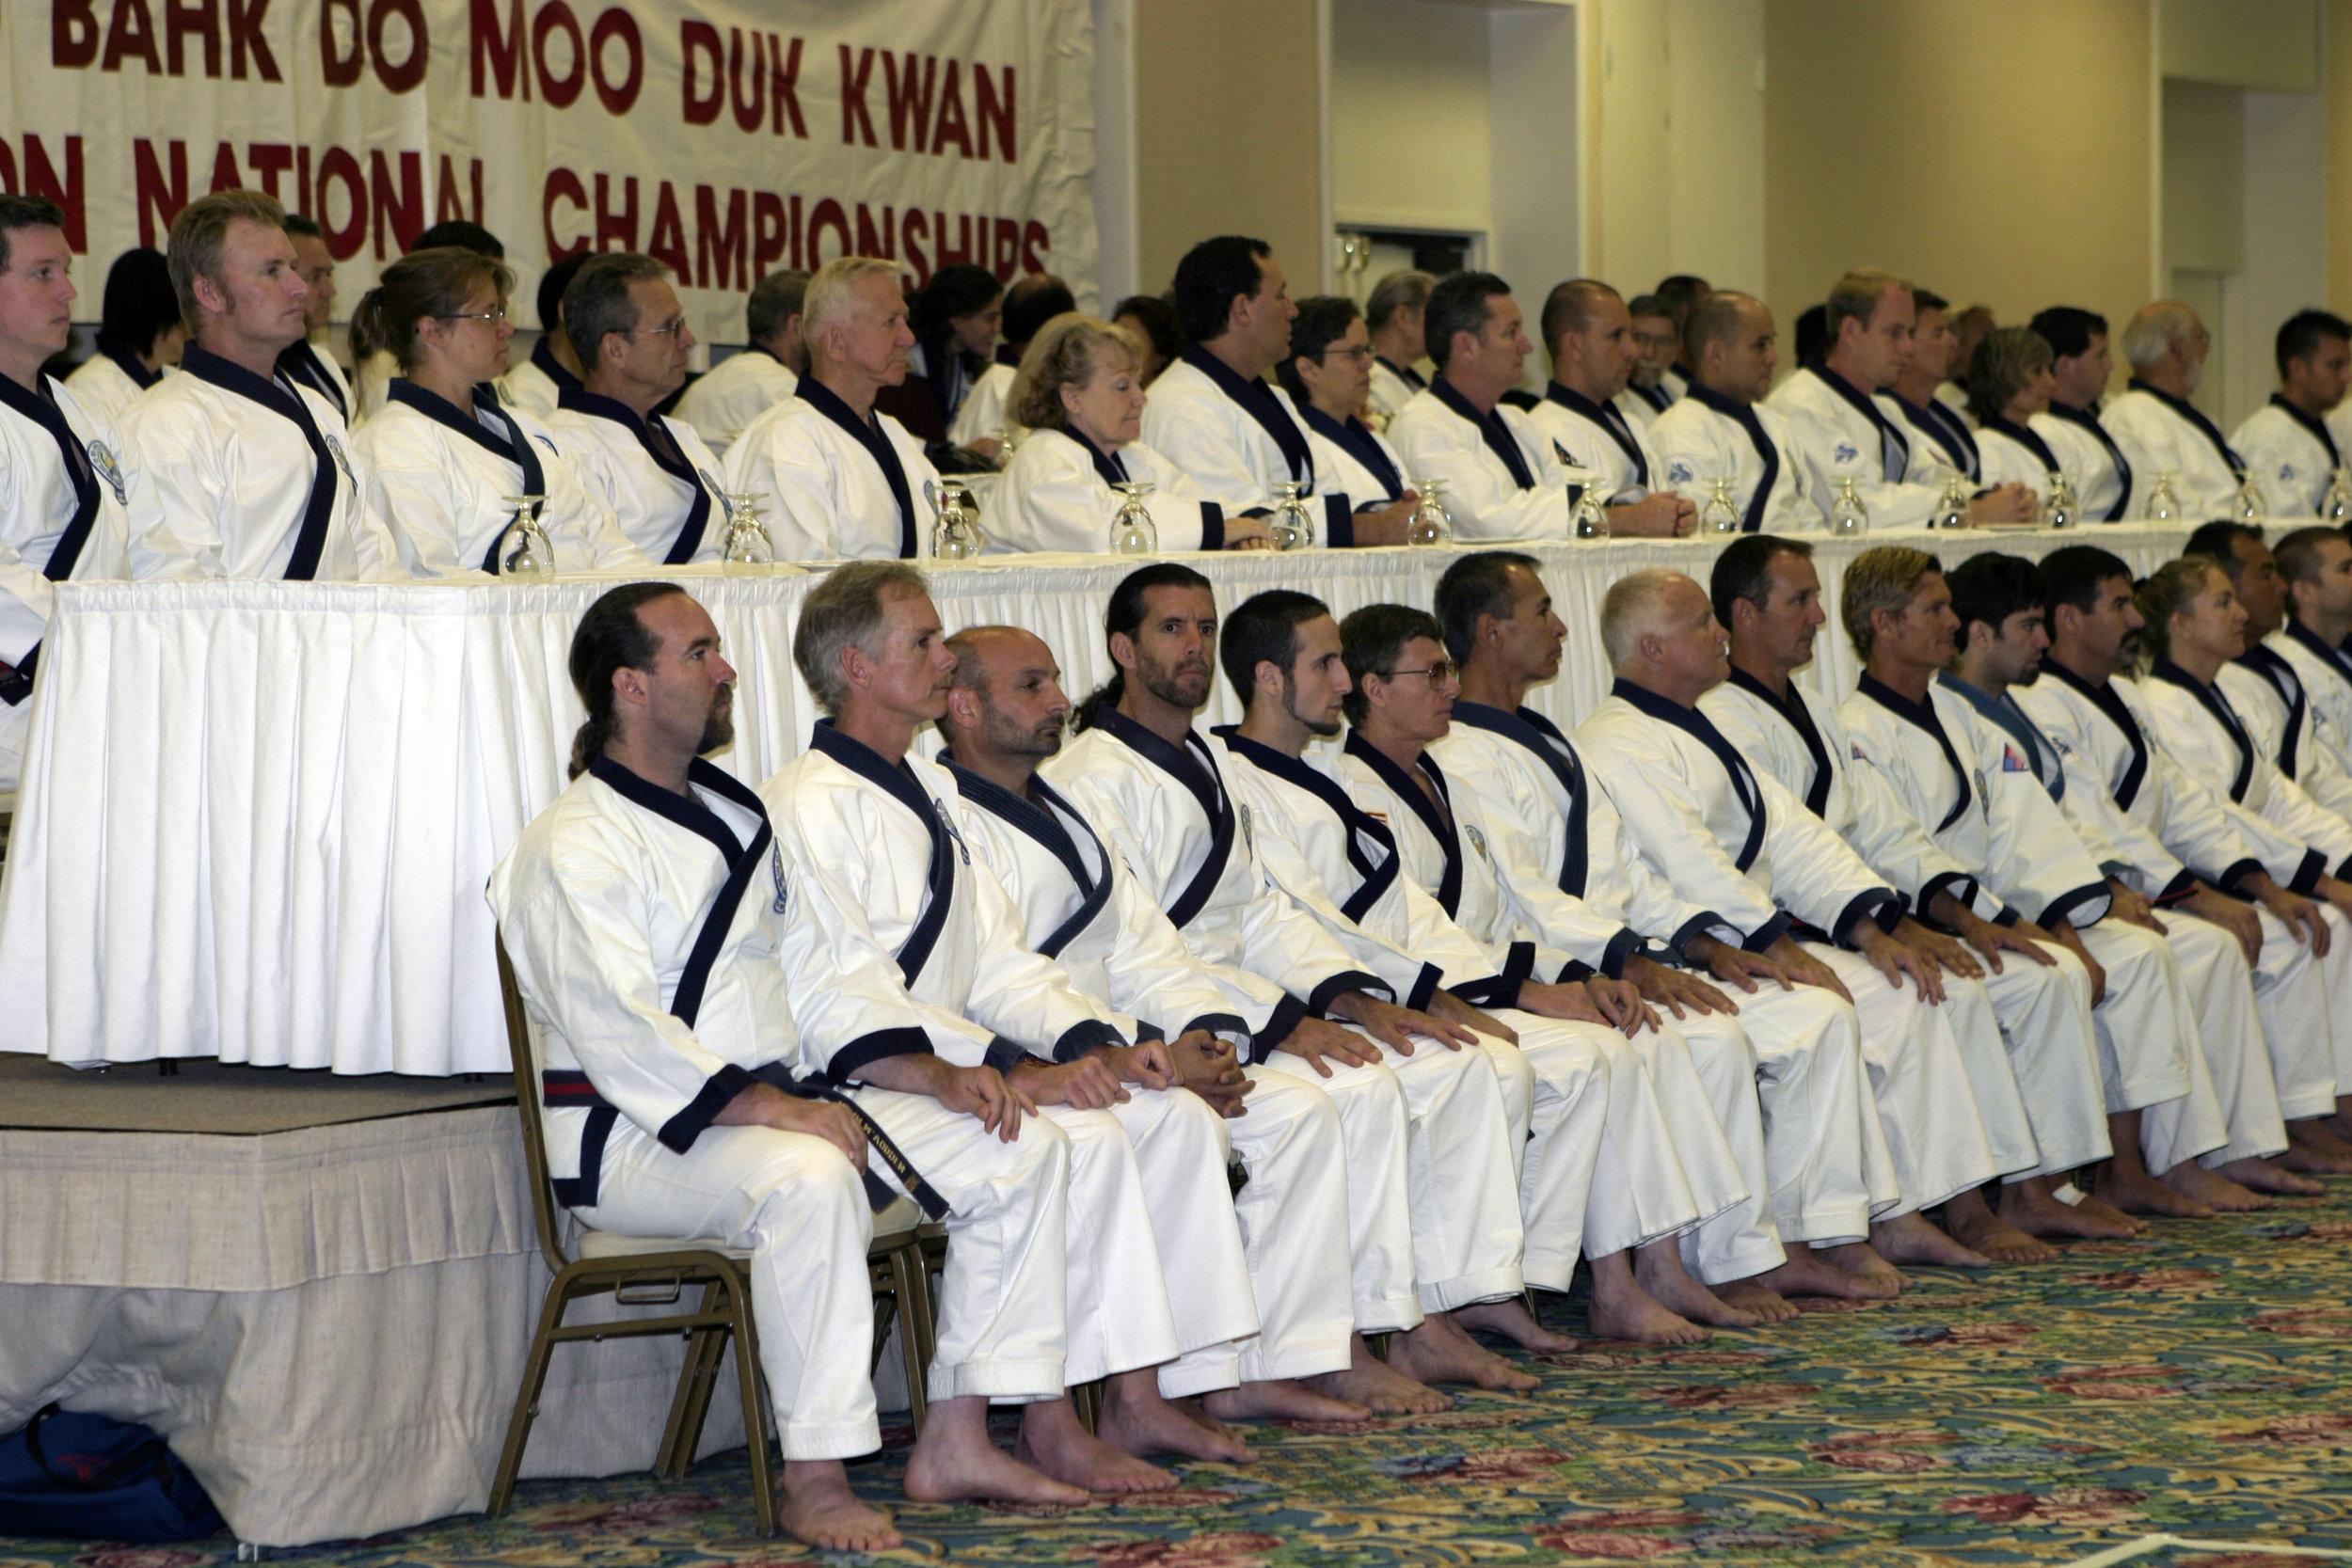 2006_13 Soo Bahk Do National Championship.JPG